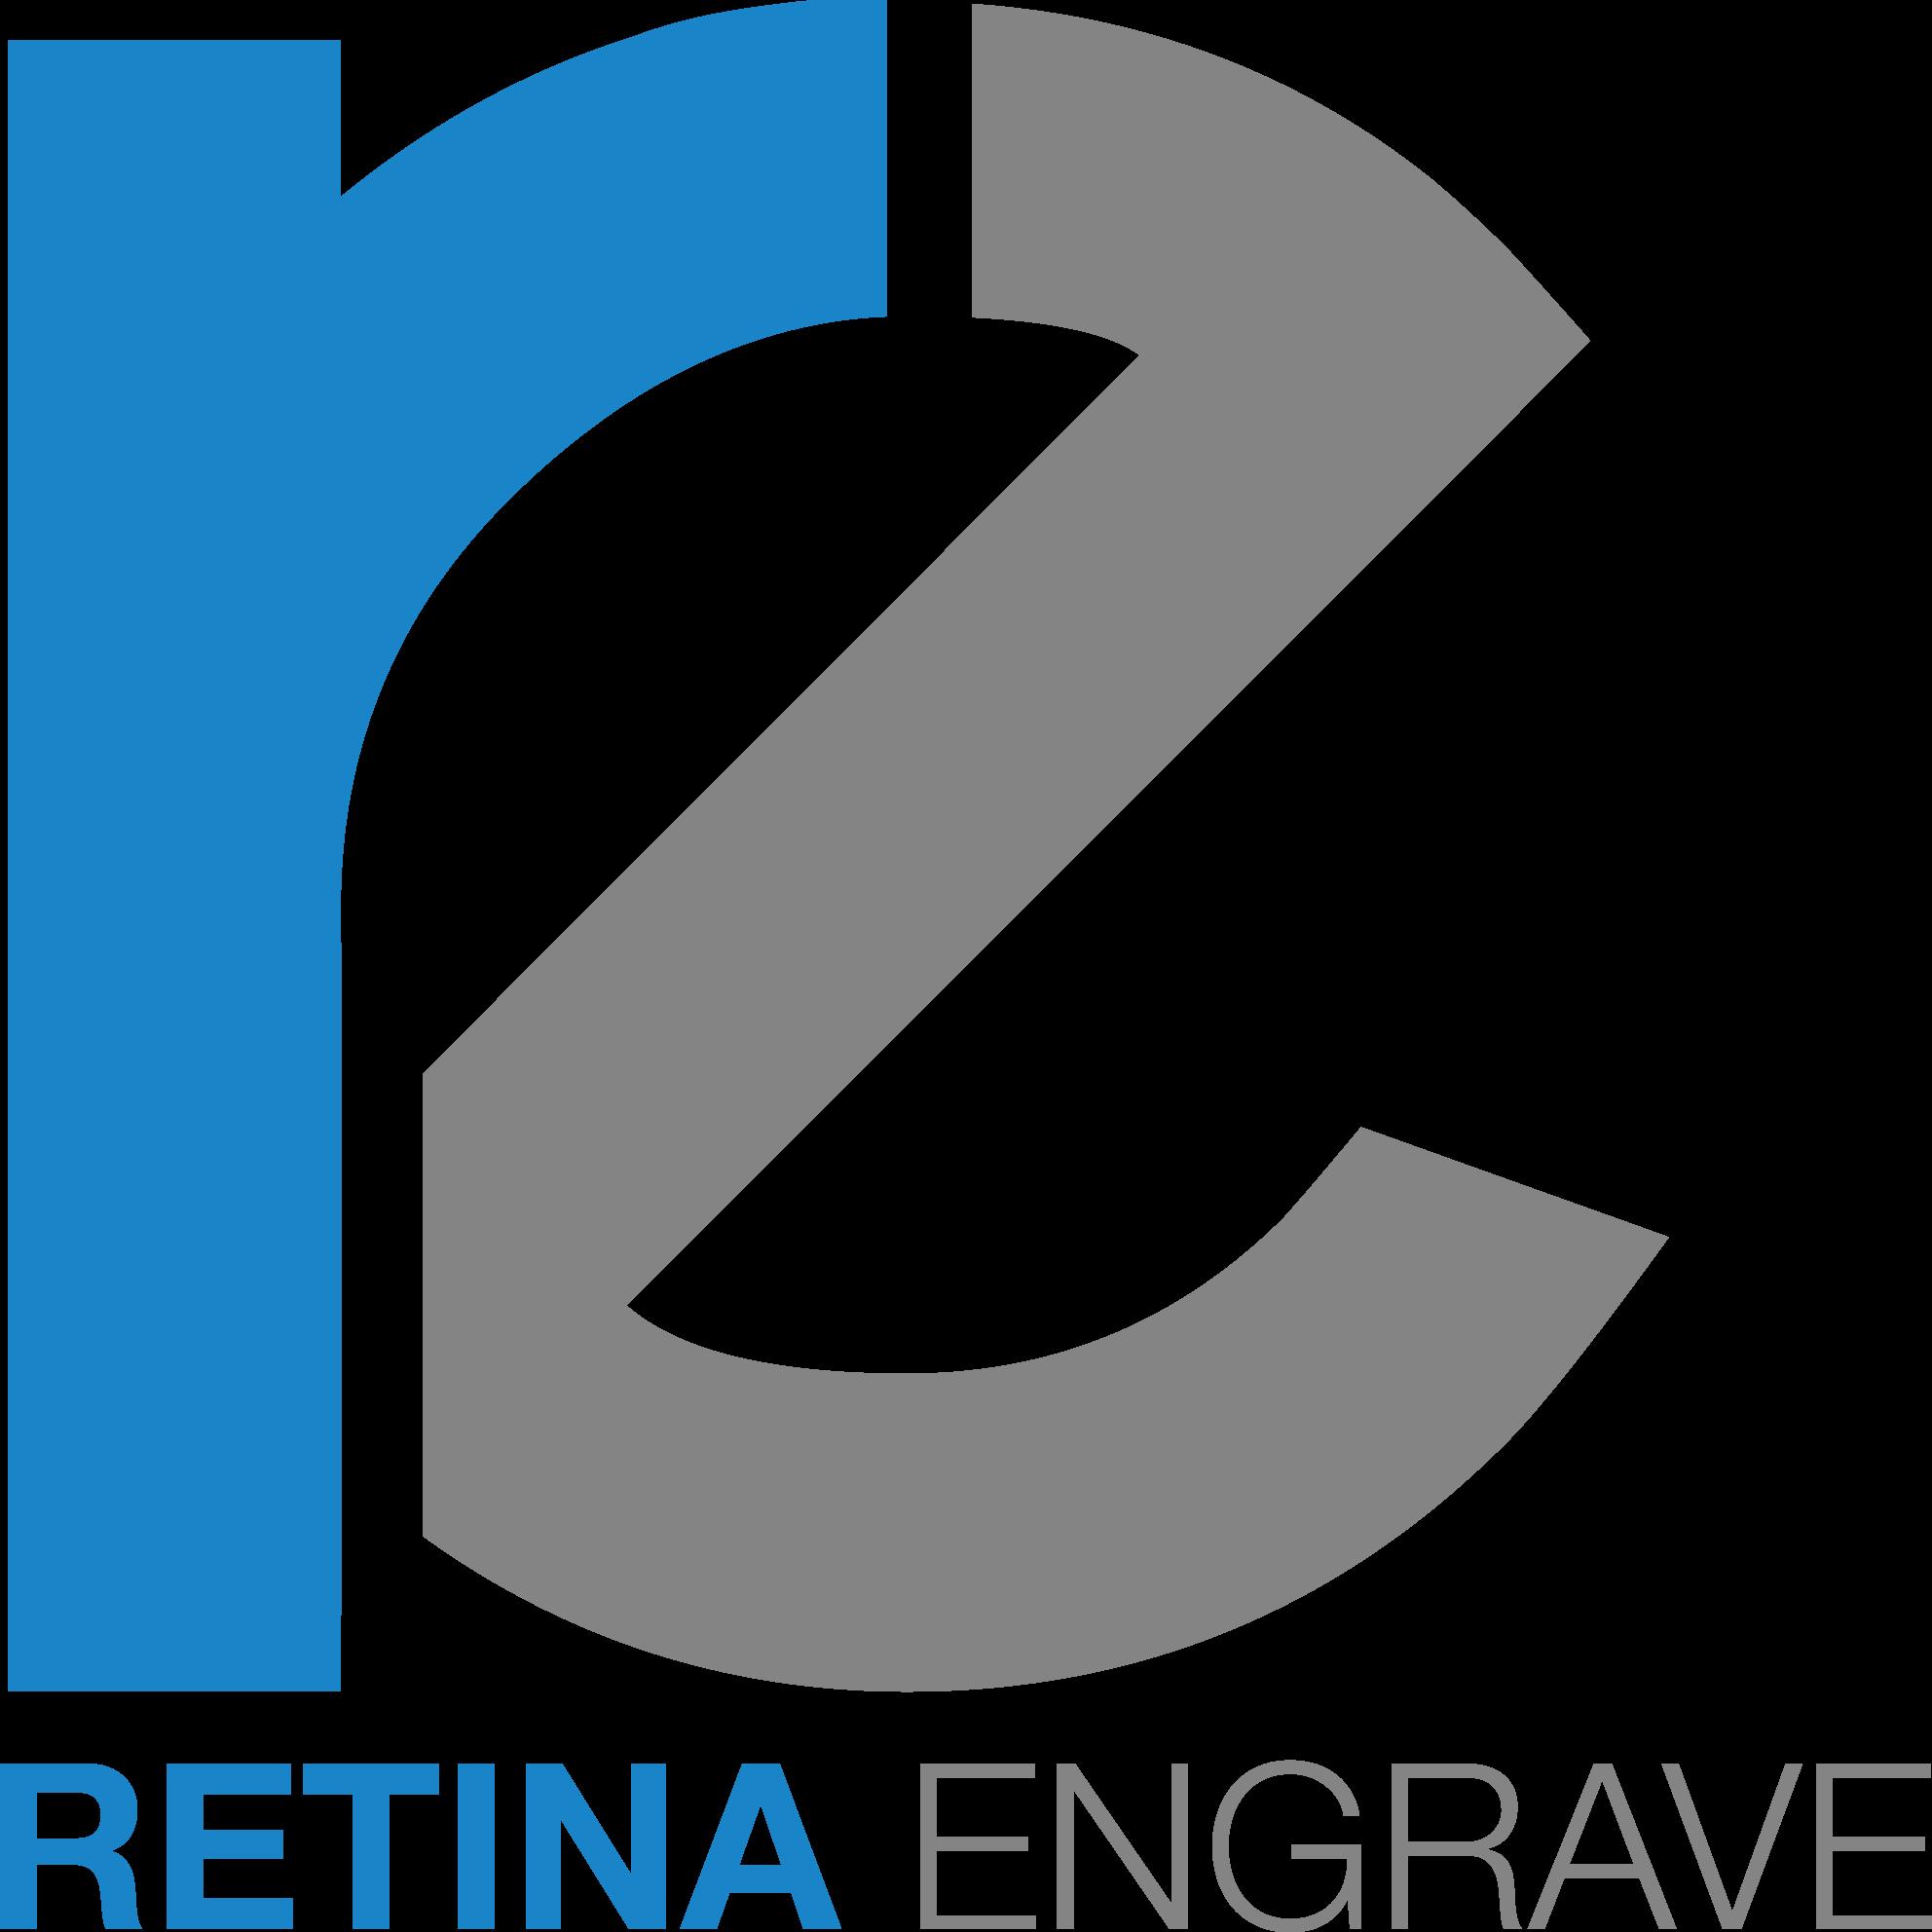 retinaengrave-logo_re3